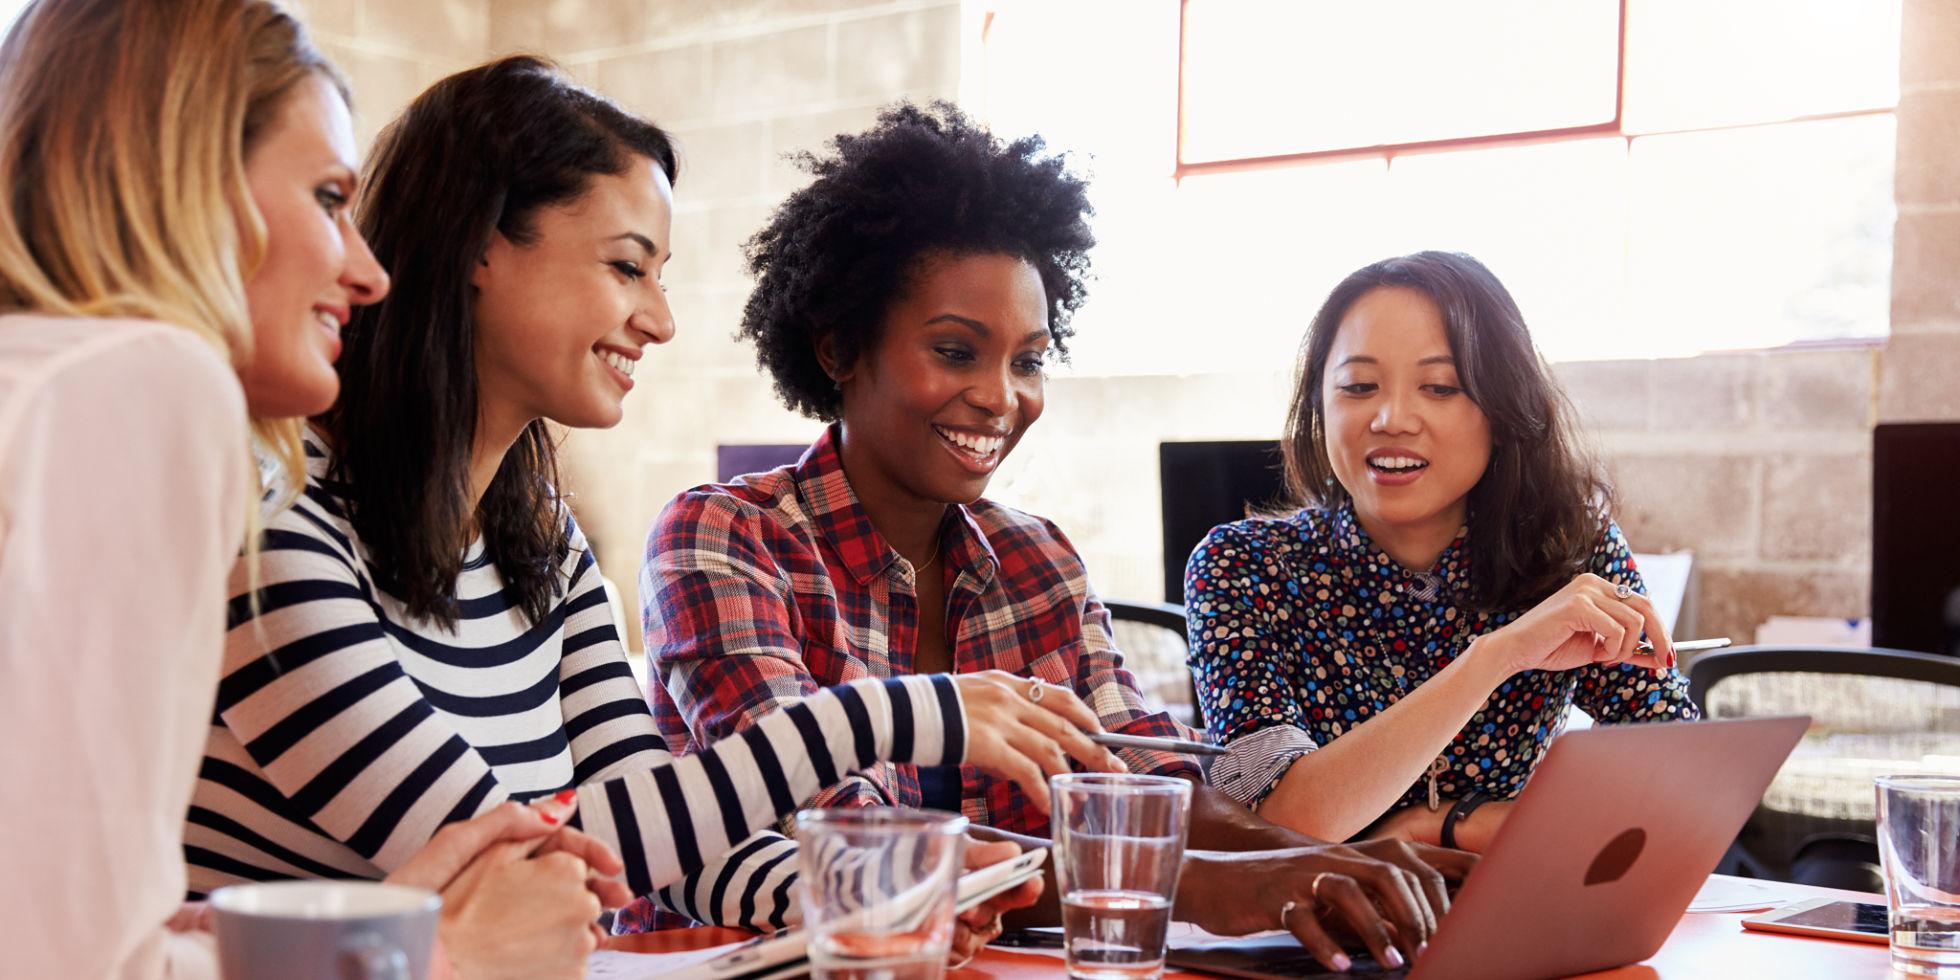 The Team, brand purpose, social purpose, brand design, design thinking, employee engagement, employee experience, customer experience, gender pay gap, employee engagement